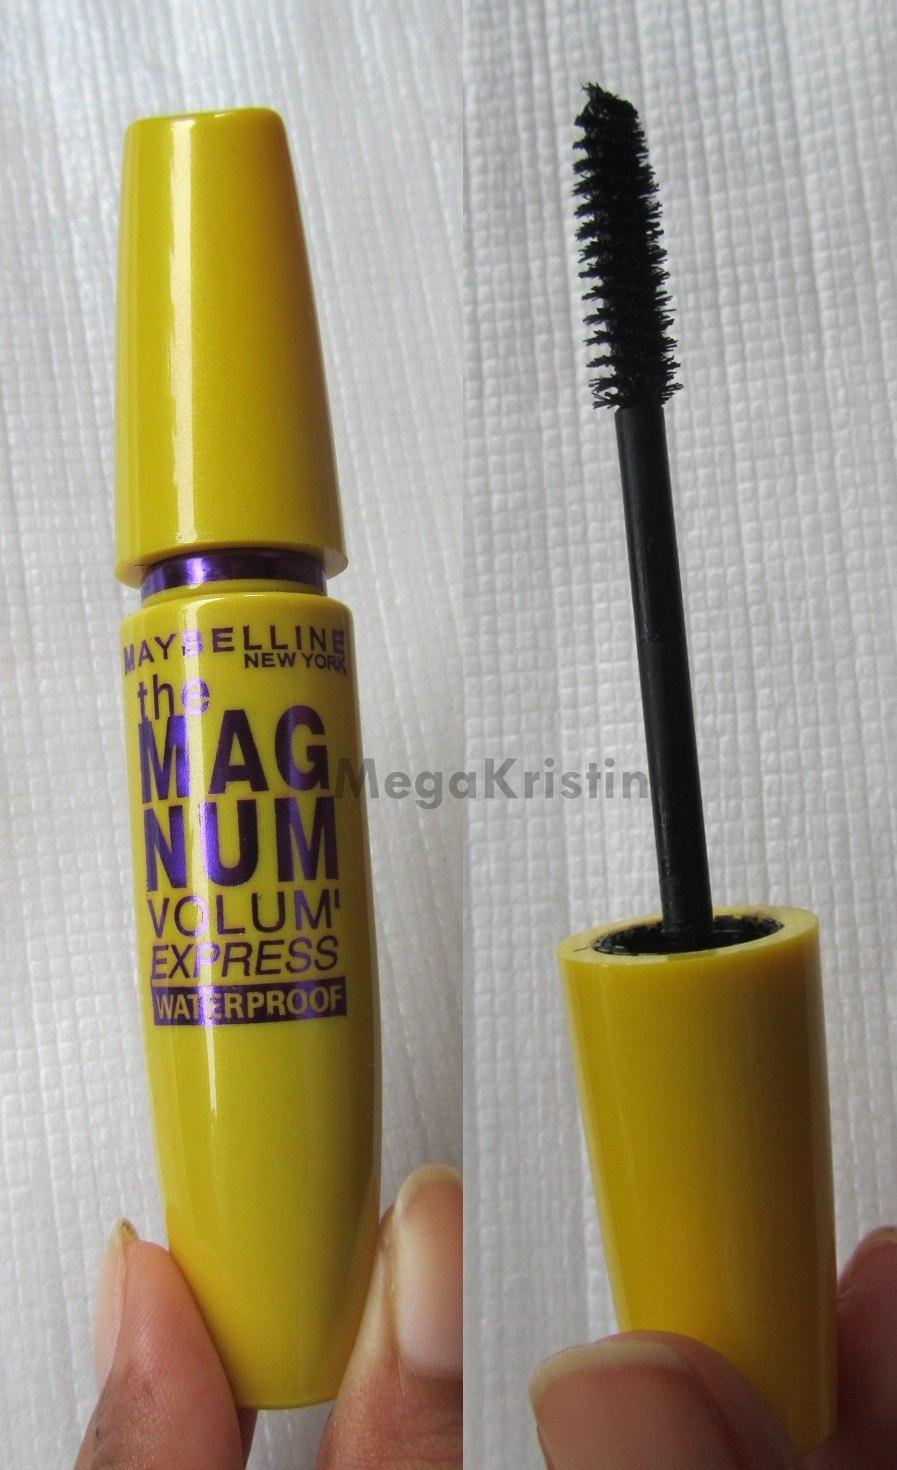 Mascara Maybelline Magnum Meinafrikanischemangotabletten Barbie The Volum Express Waterproof Mega Kristin